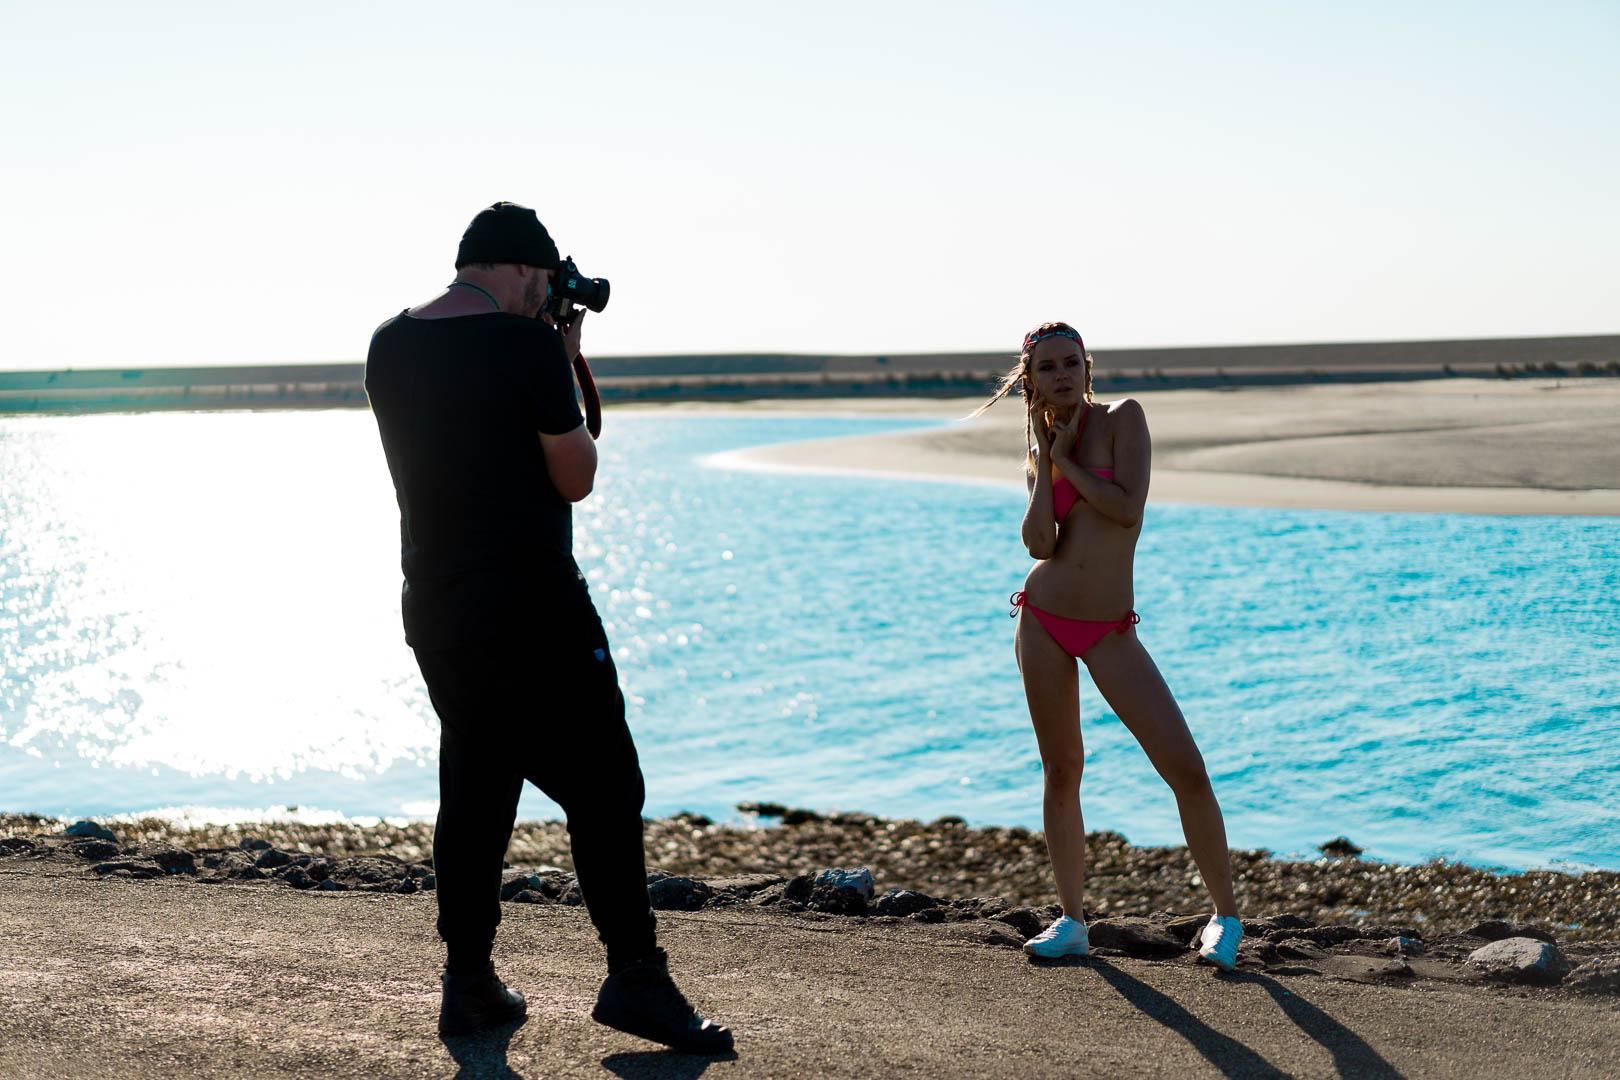 photographer-shooting-editorial-modeling-agency-ocean-beach-rocks-zara-bikini-model